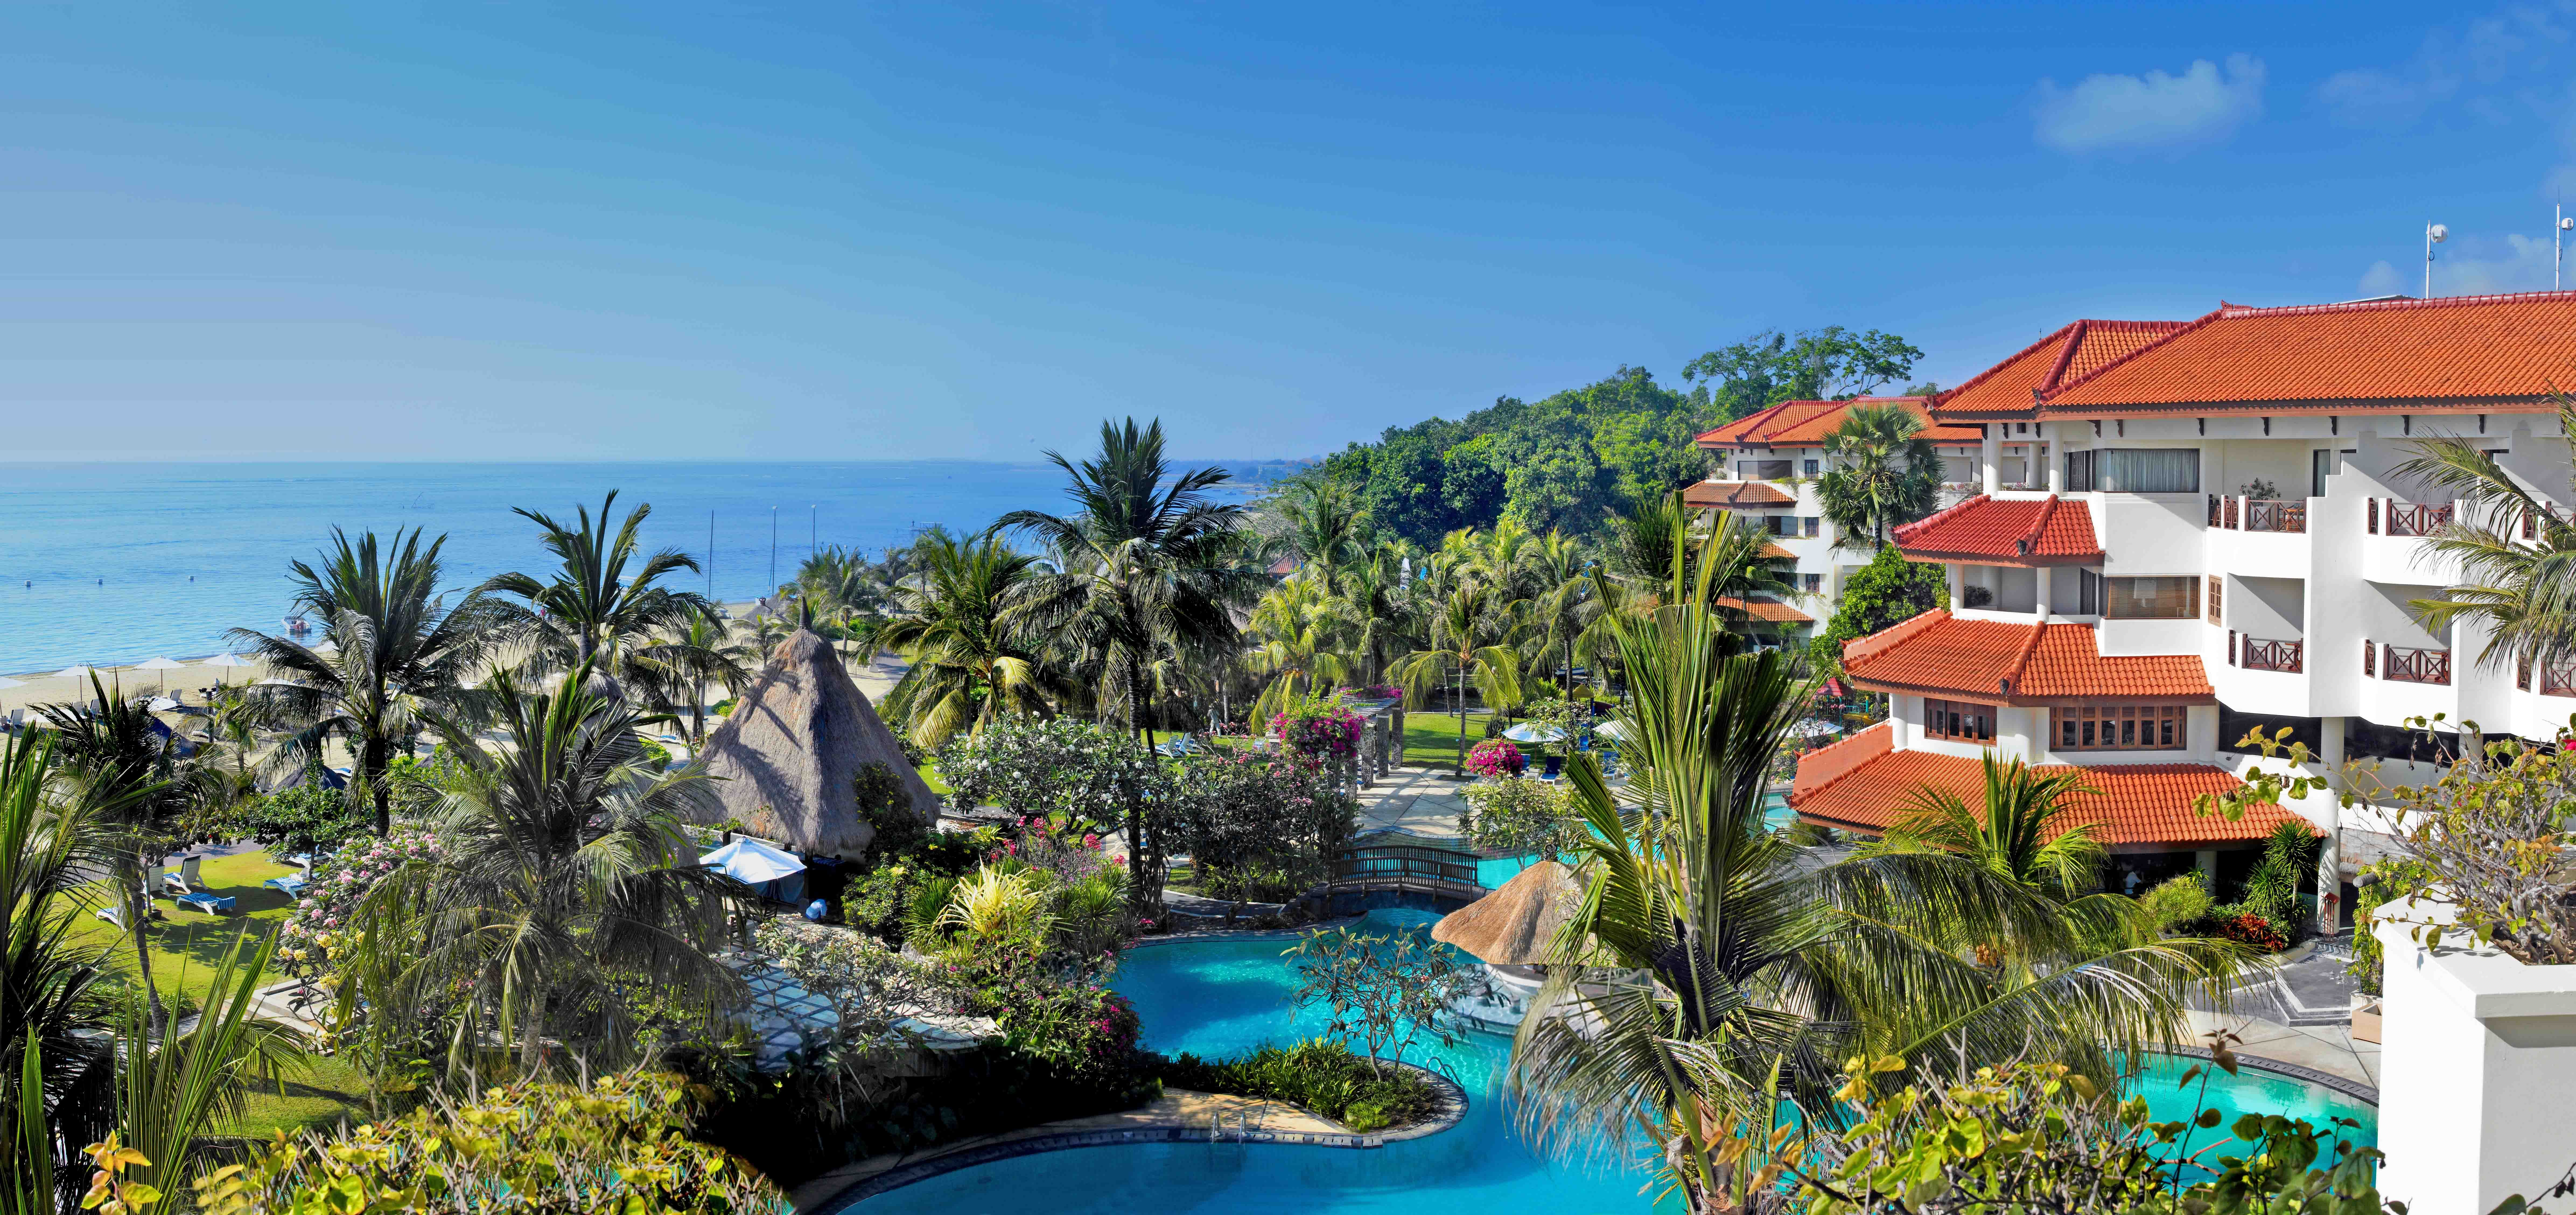 Grand Mirage Resort and Thalasso Bali  All inclusive